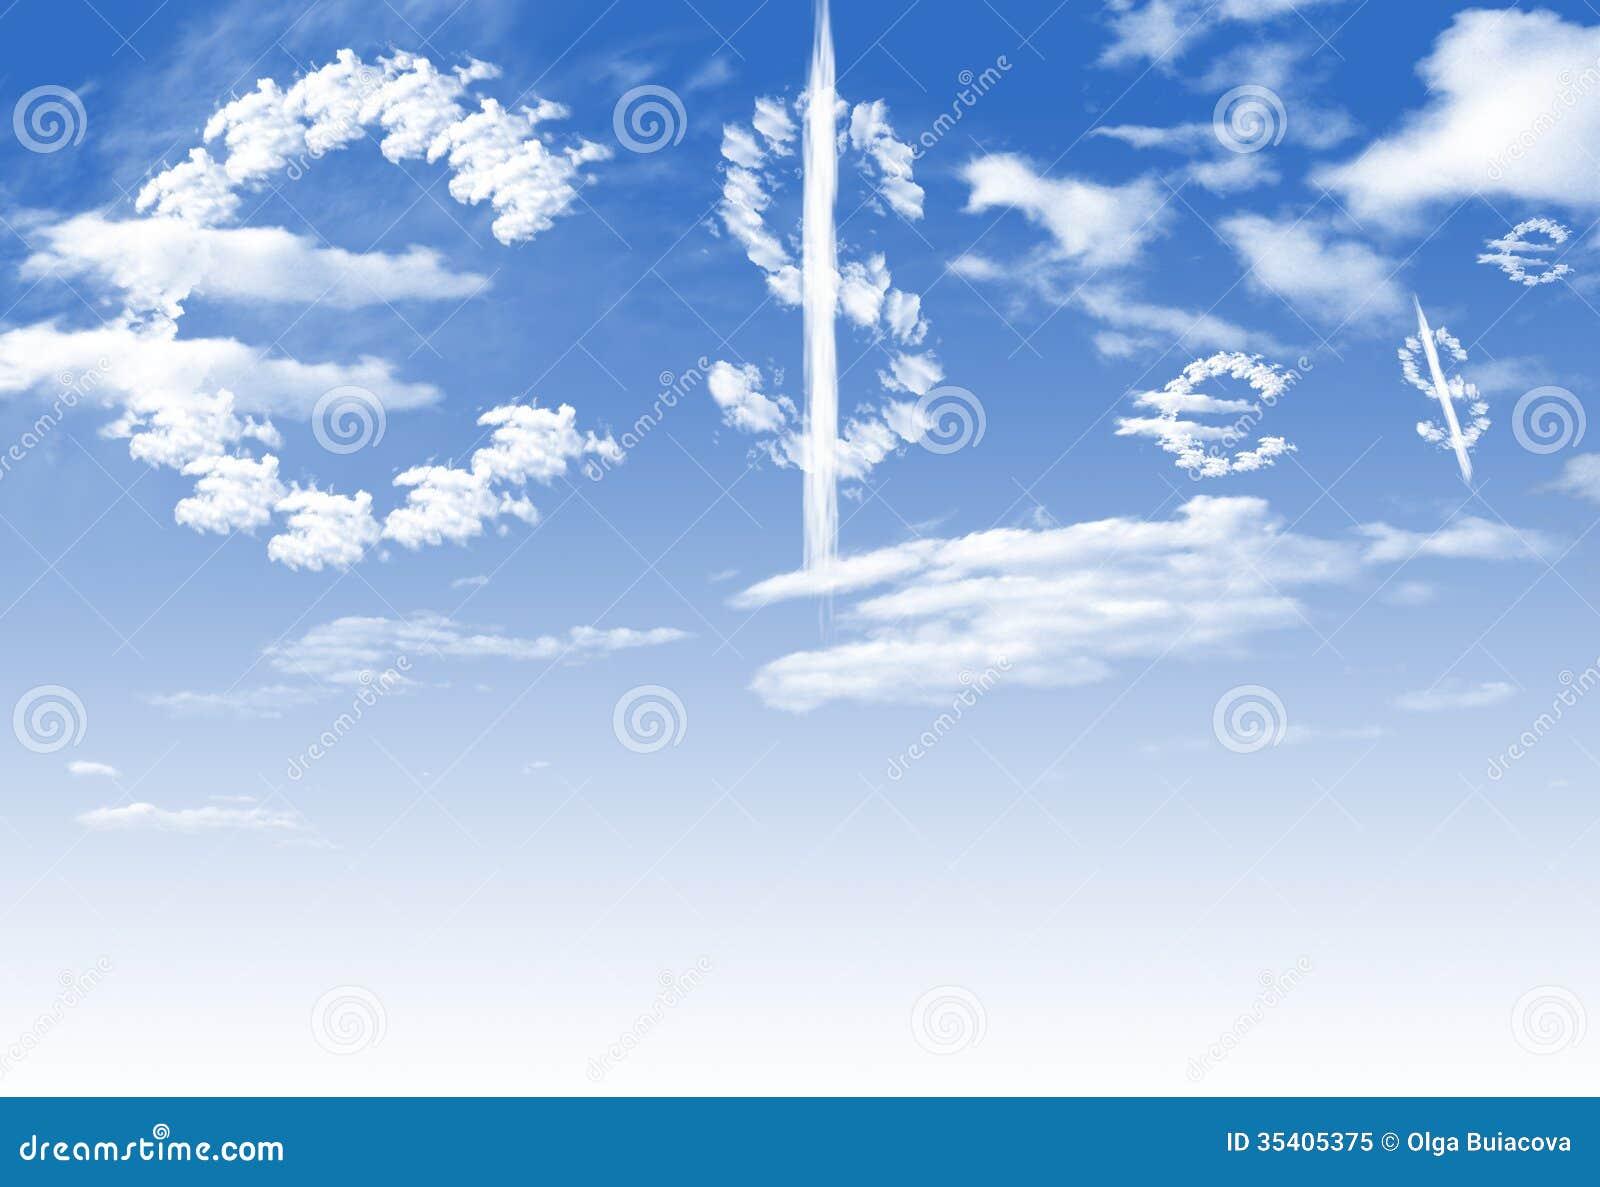 Cloud euro currency symbol shape stock image image of clean cloud euro and currency symbol shape over sky royalty free stock photo buycottarizona Choice Image